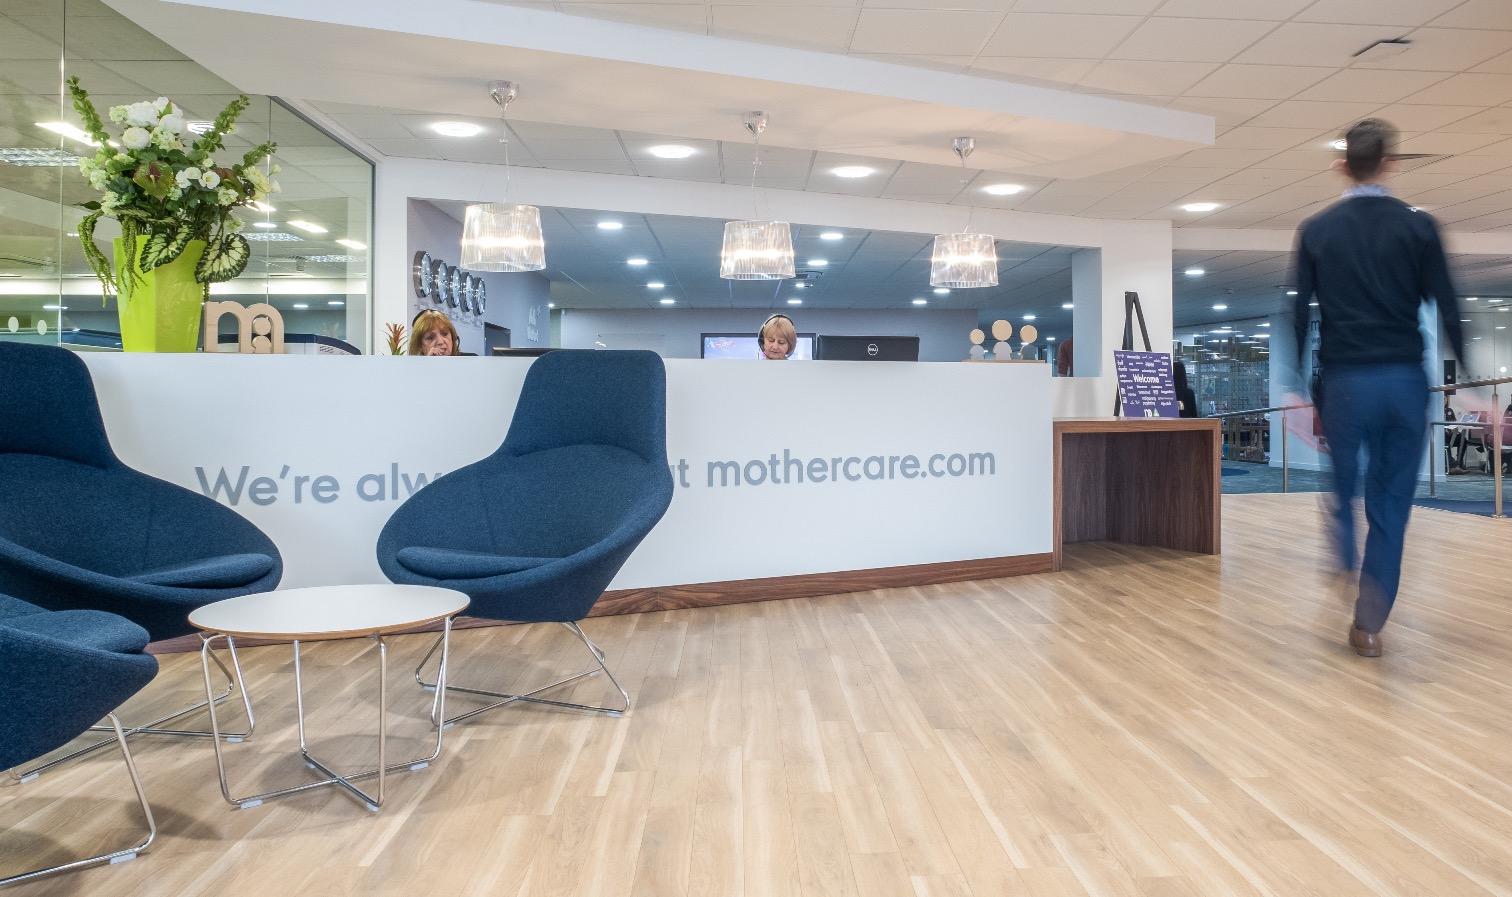 Inside mothercare s new watford office officelovin 39 for Office design principles